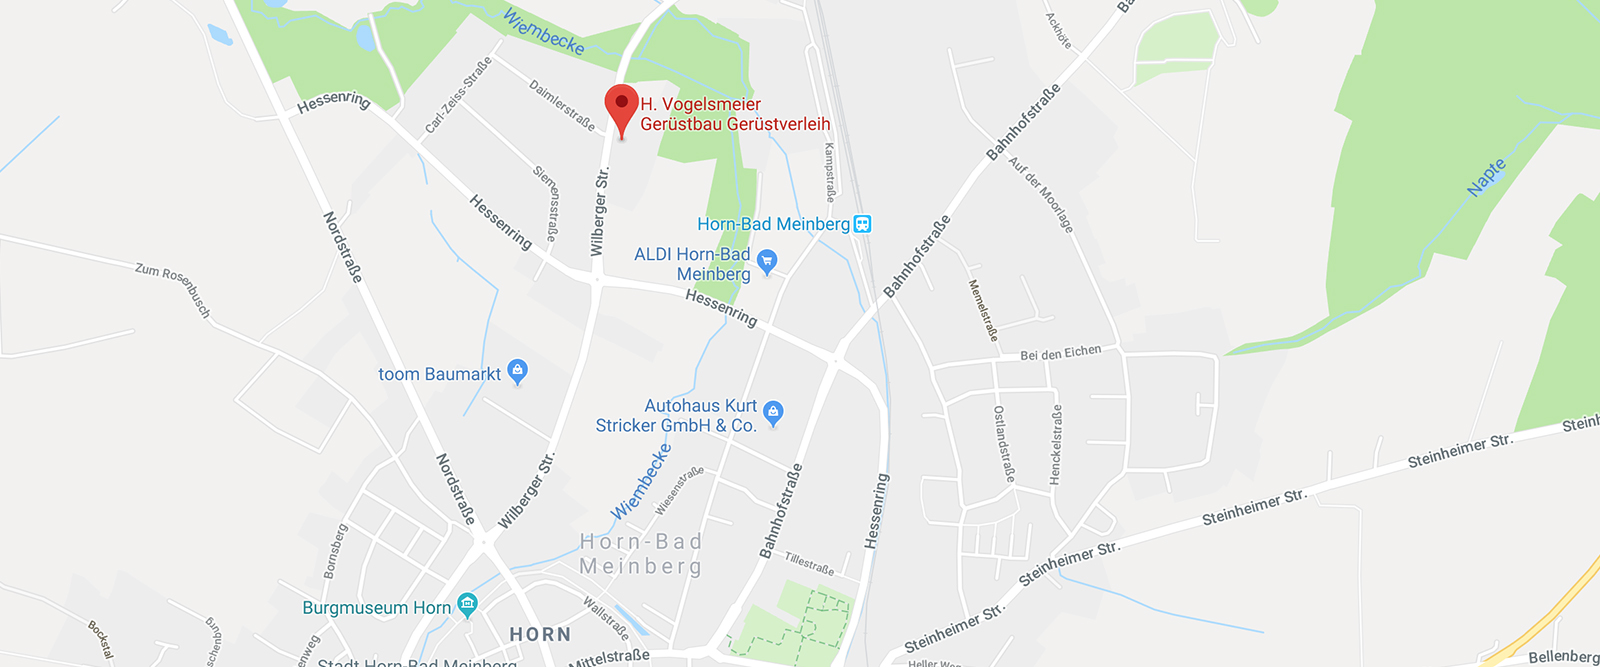 H. VOGELSMEIER Gerüstbau GmbH